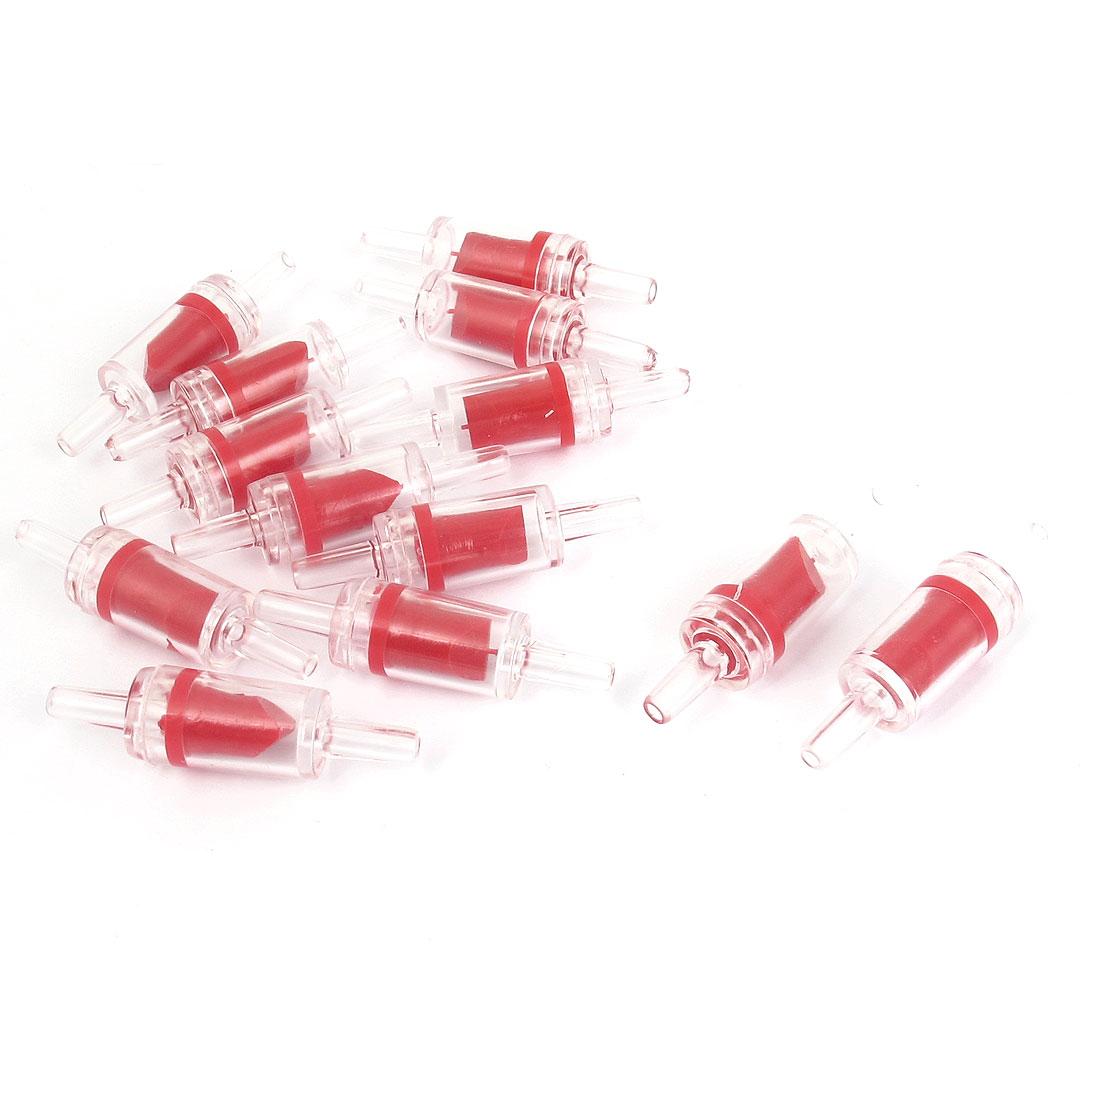 13pcs Red Clear Plastic Air Pump Outlet Check Valves for Aquarium Fishbowl